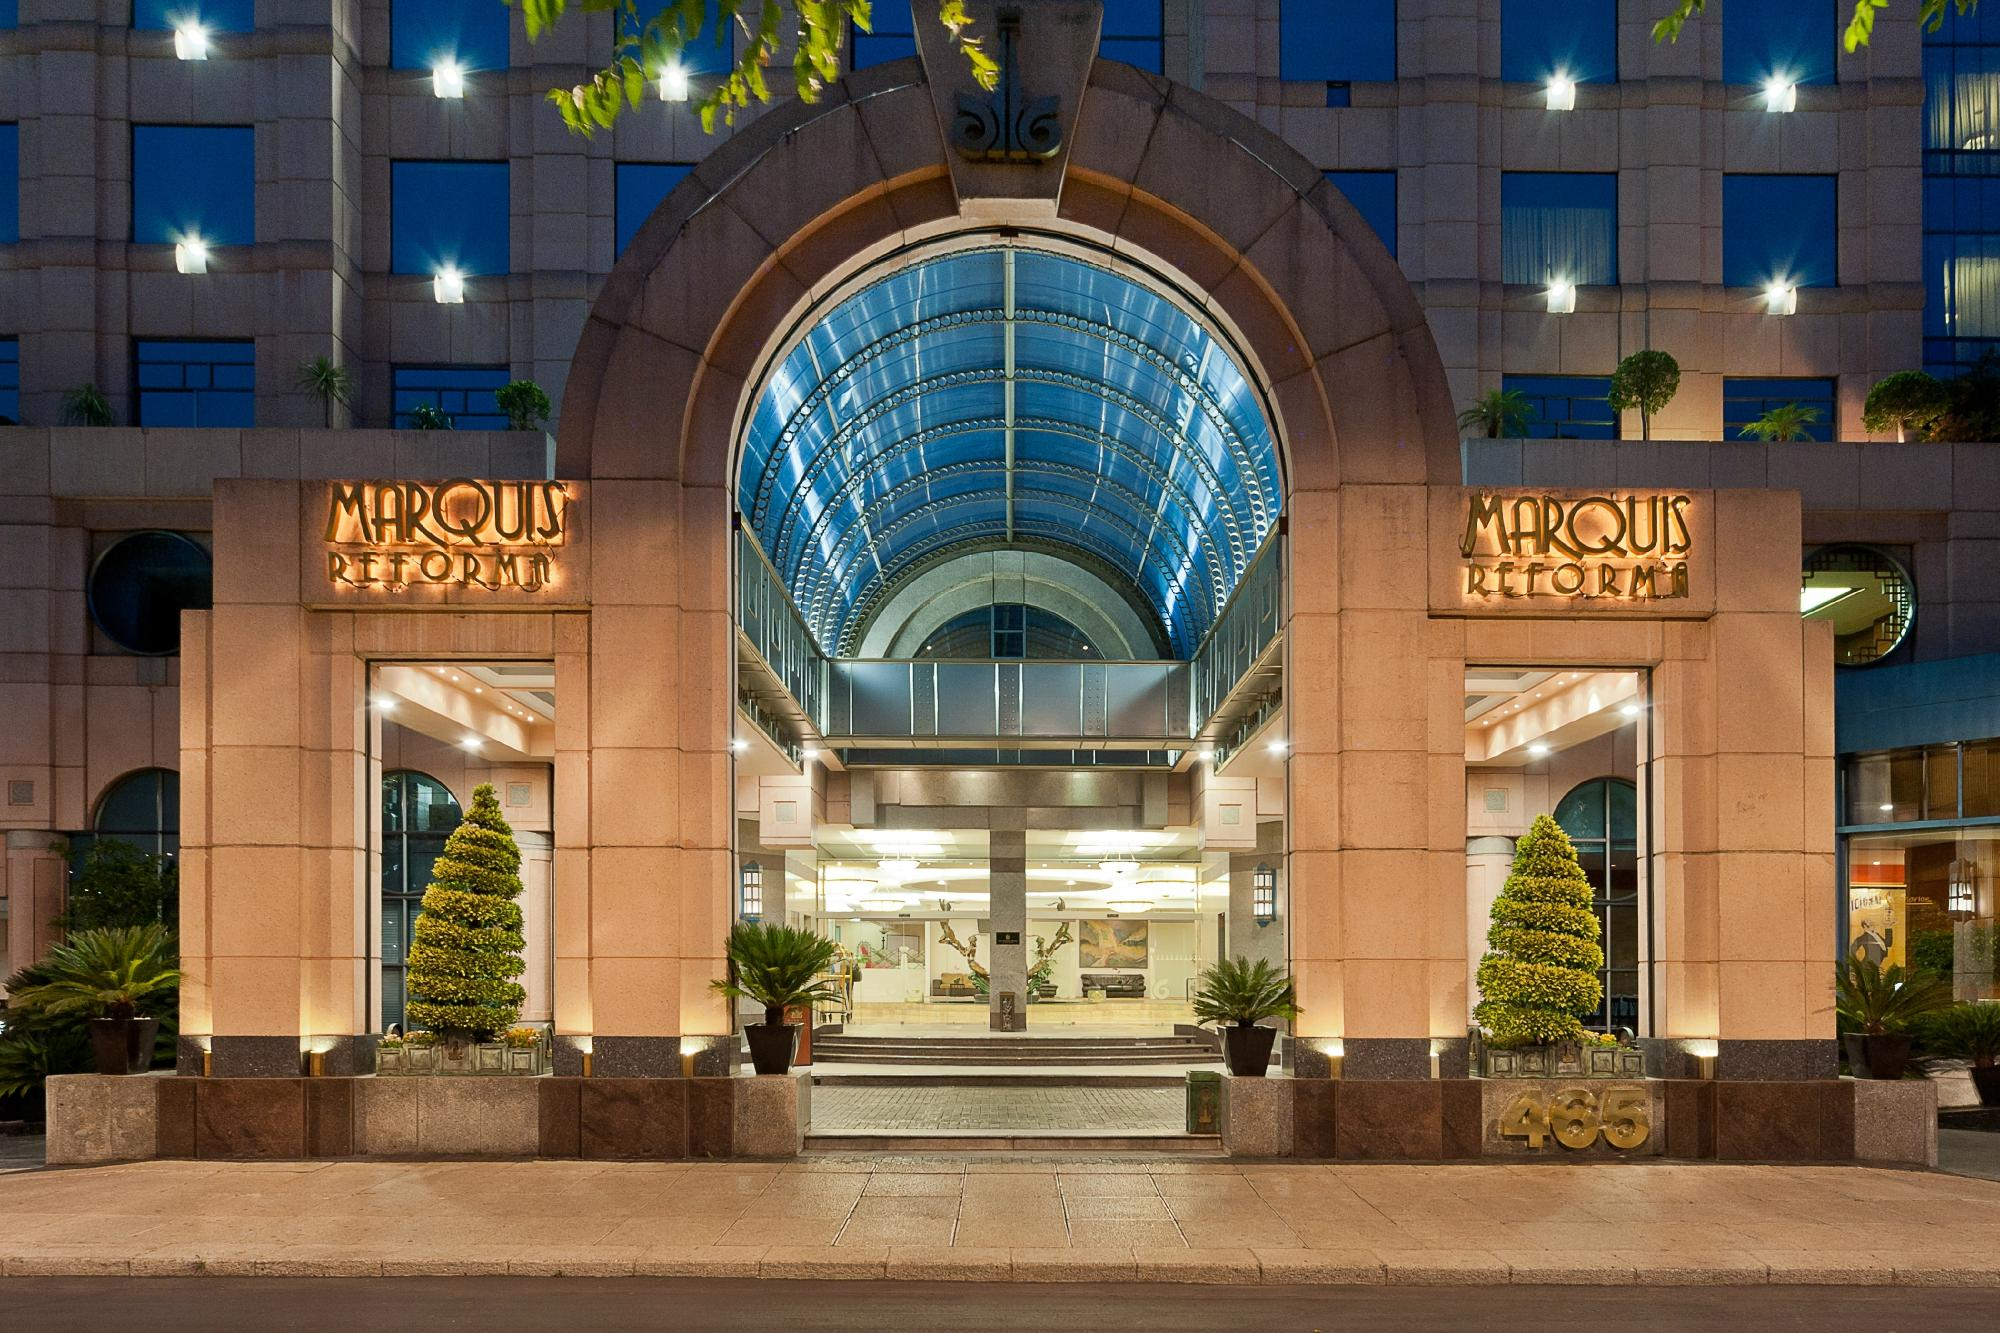 Marquis Reforma Hotel